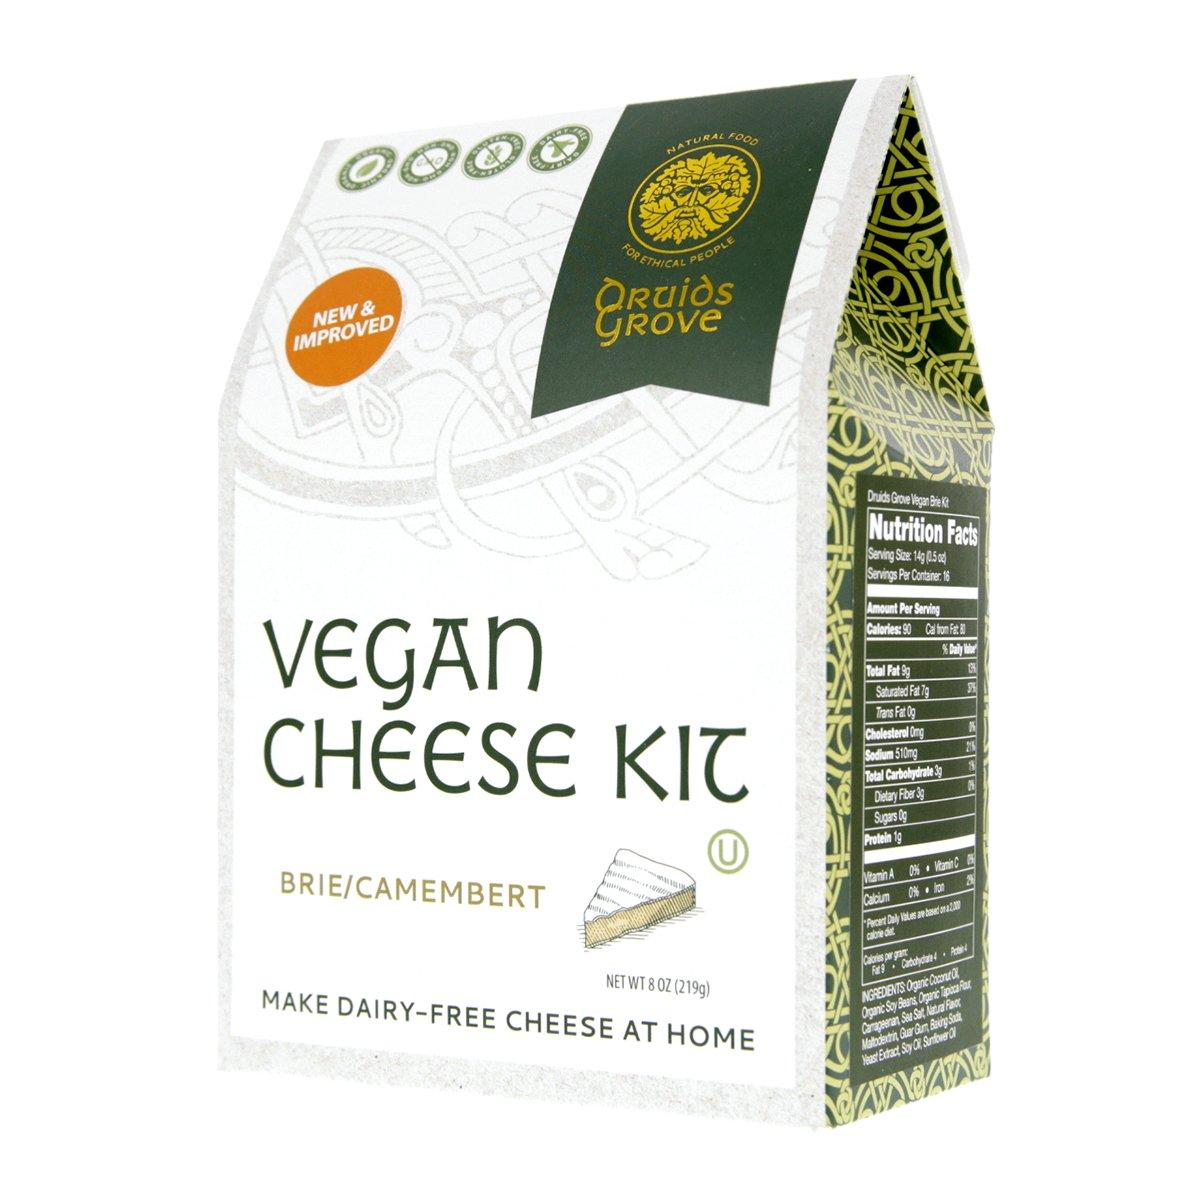 Druids Grove Vegan Brie Kit (Nondairy Cheese) ☮ Vegan ⊘ Non-GMO ❤ Gluten-Free ✡ OU Kosher Certified by Druids Grove